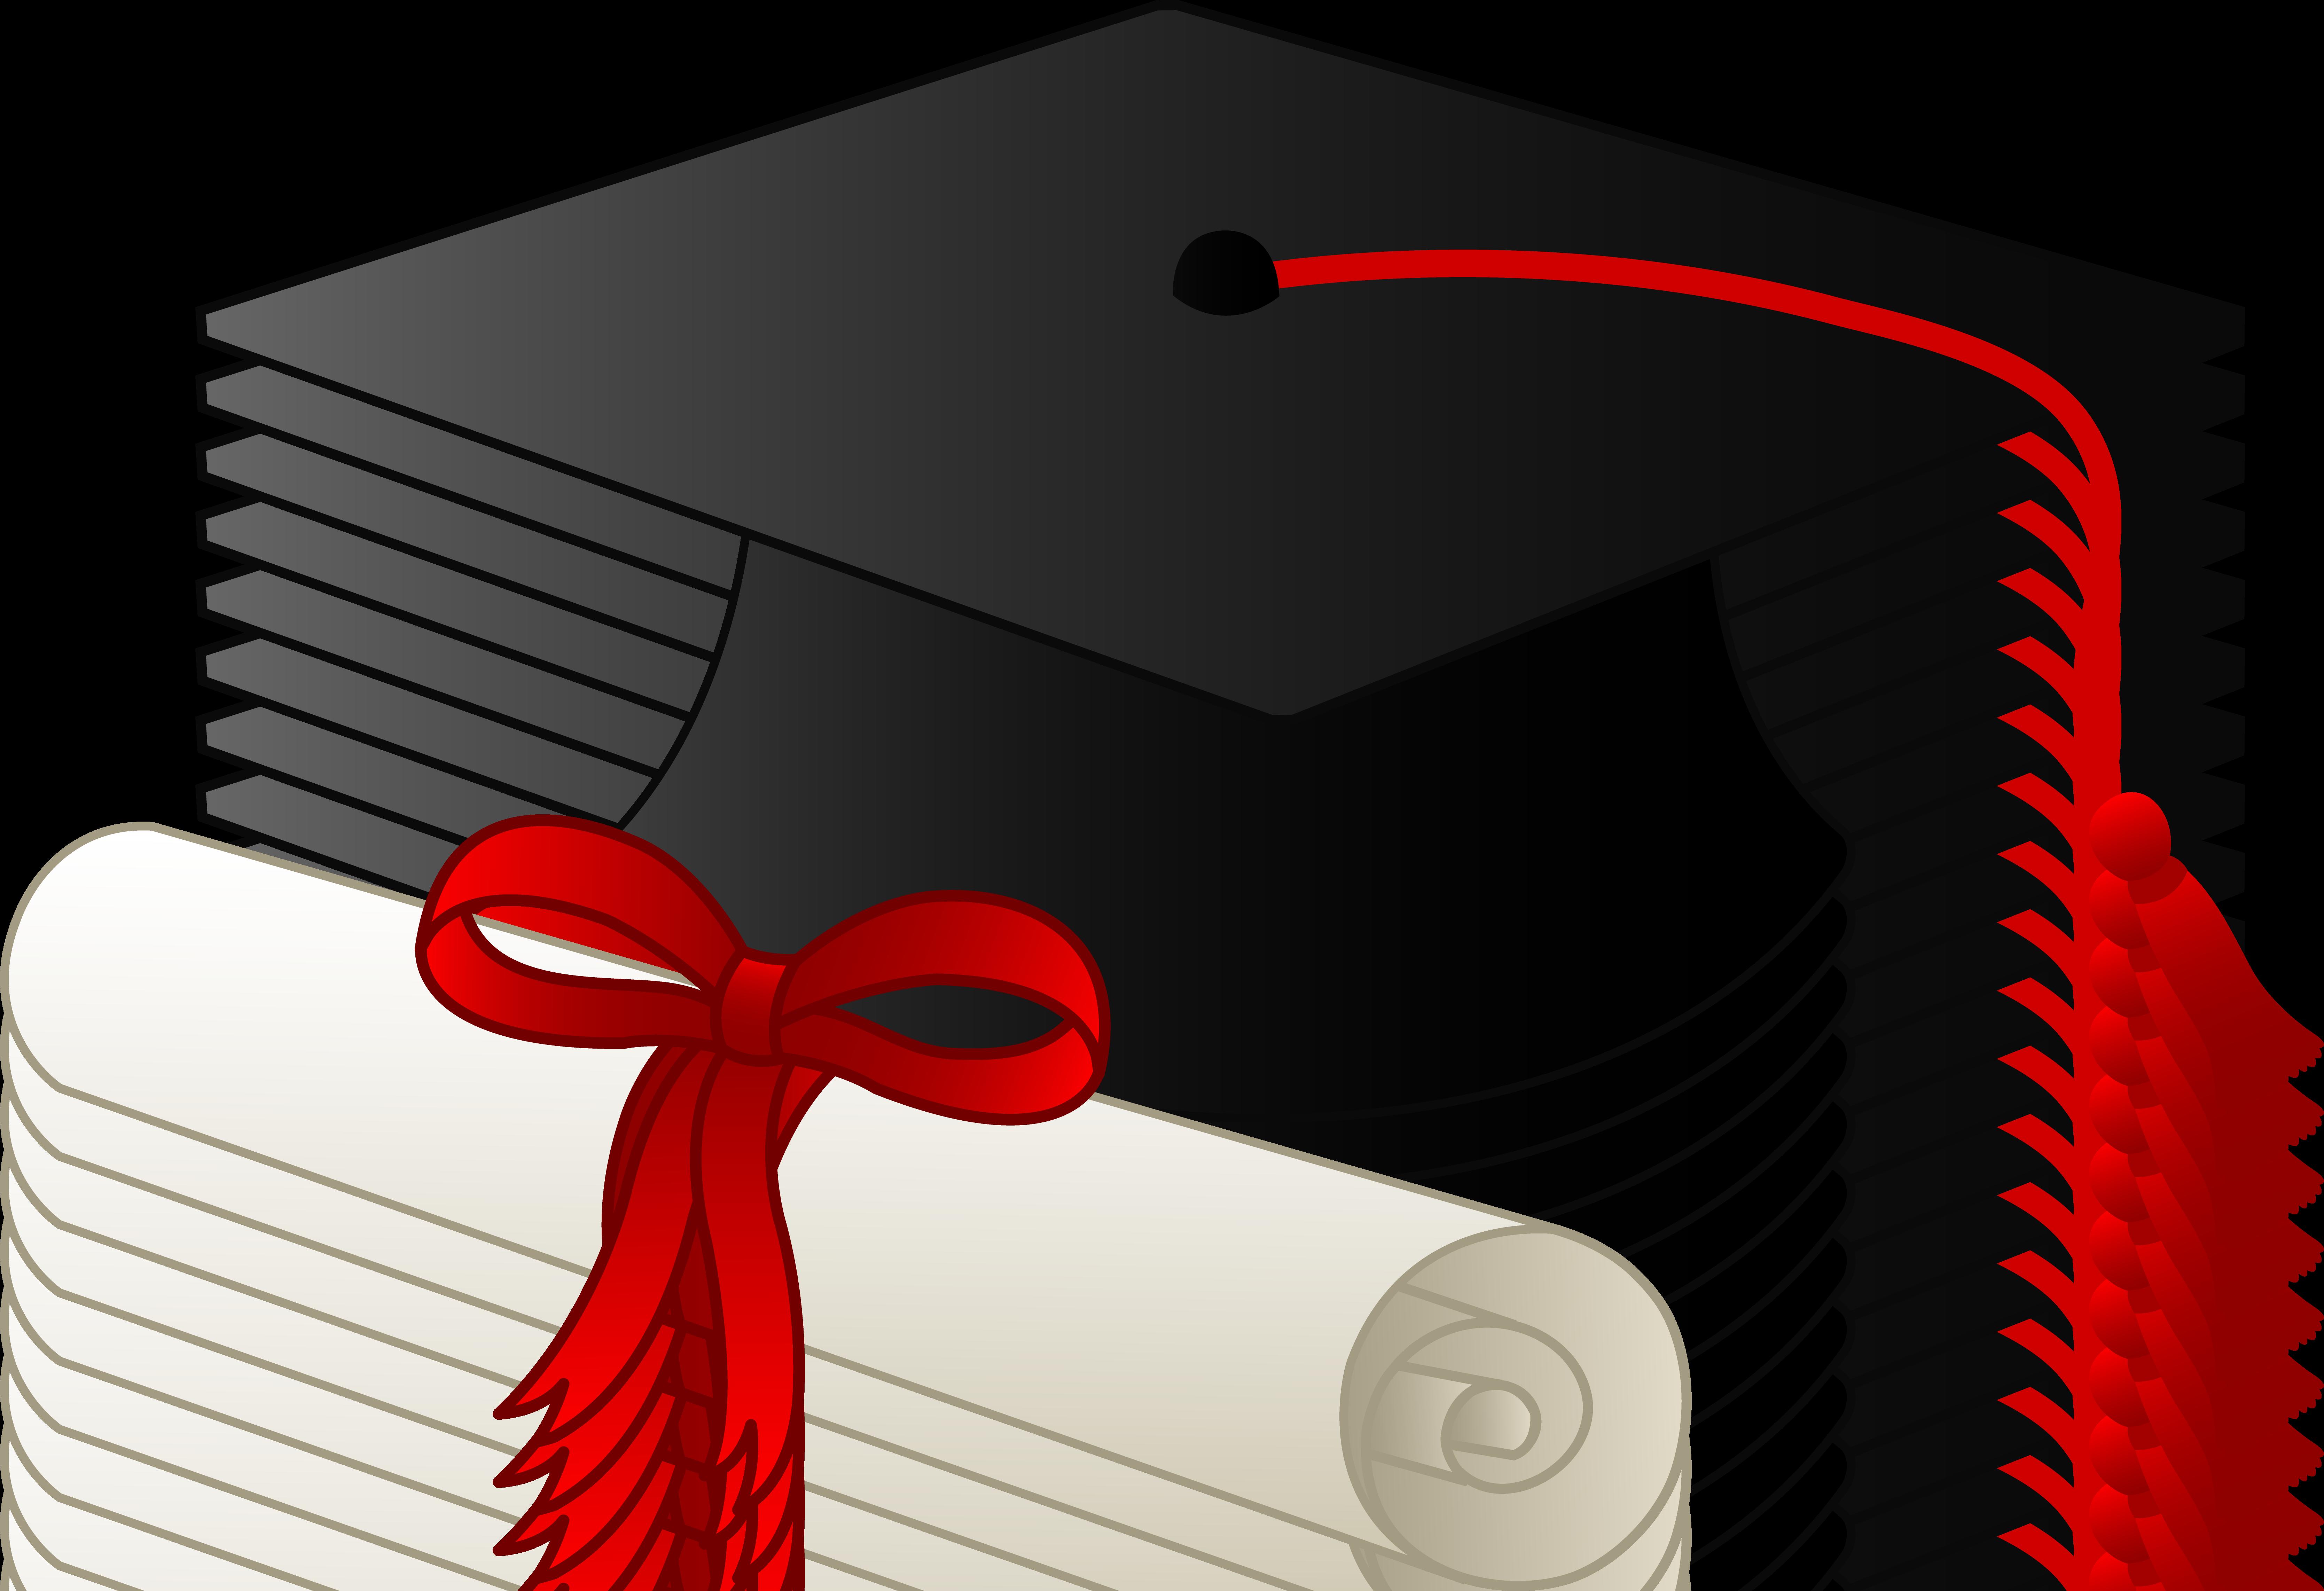 6675x4570 Graduation Images Clip Art